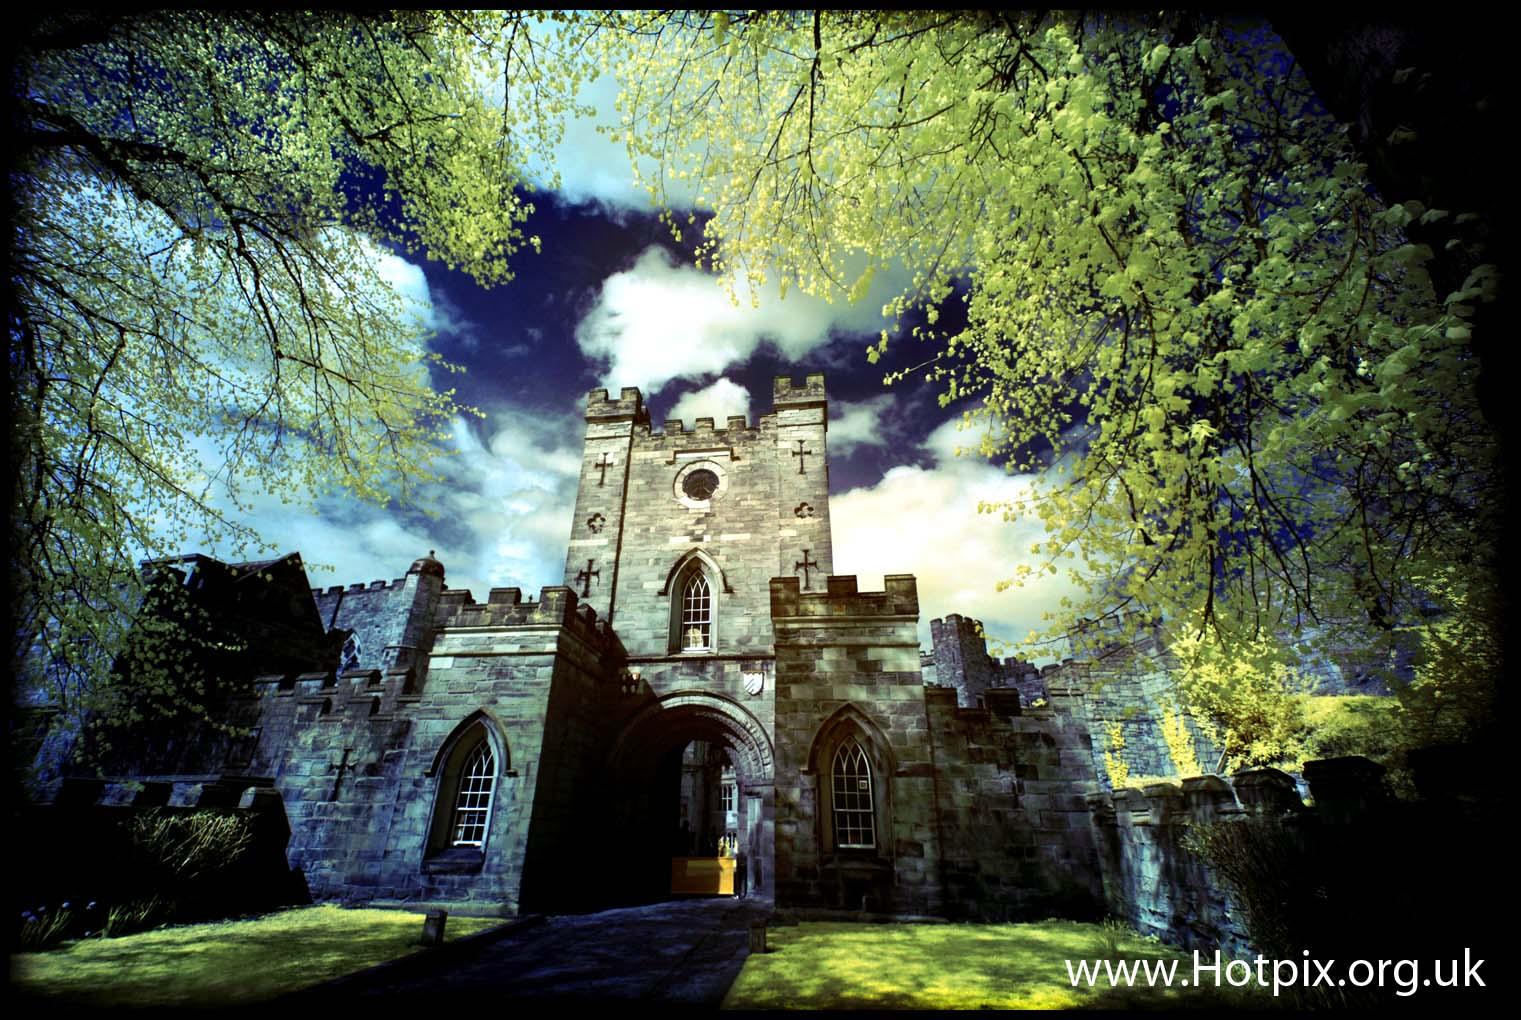 NE England Durham county tyne & and wear Darlington,Hartlepool  area of Stockton-on-Tees  castle entrance UK GB great britain building architecture